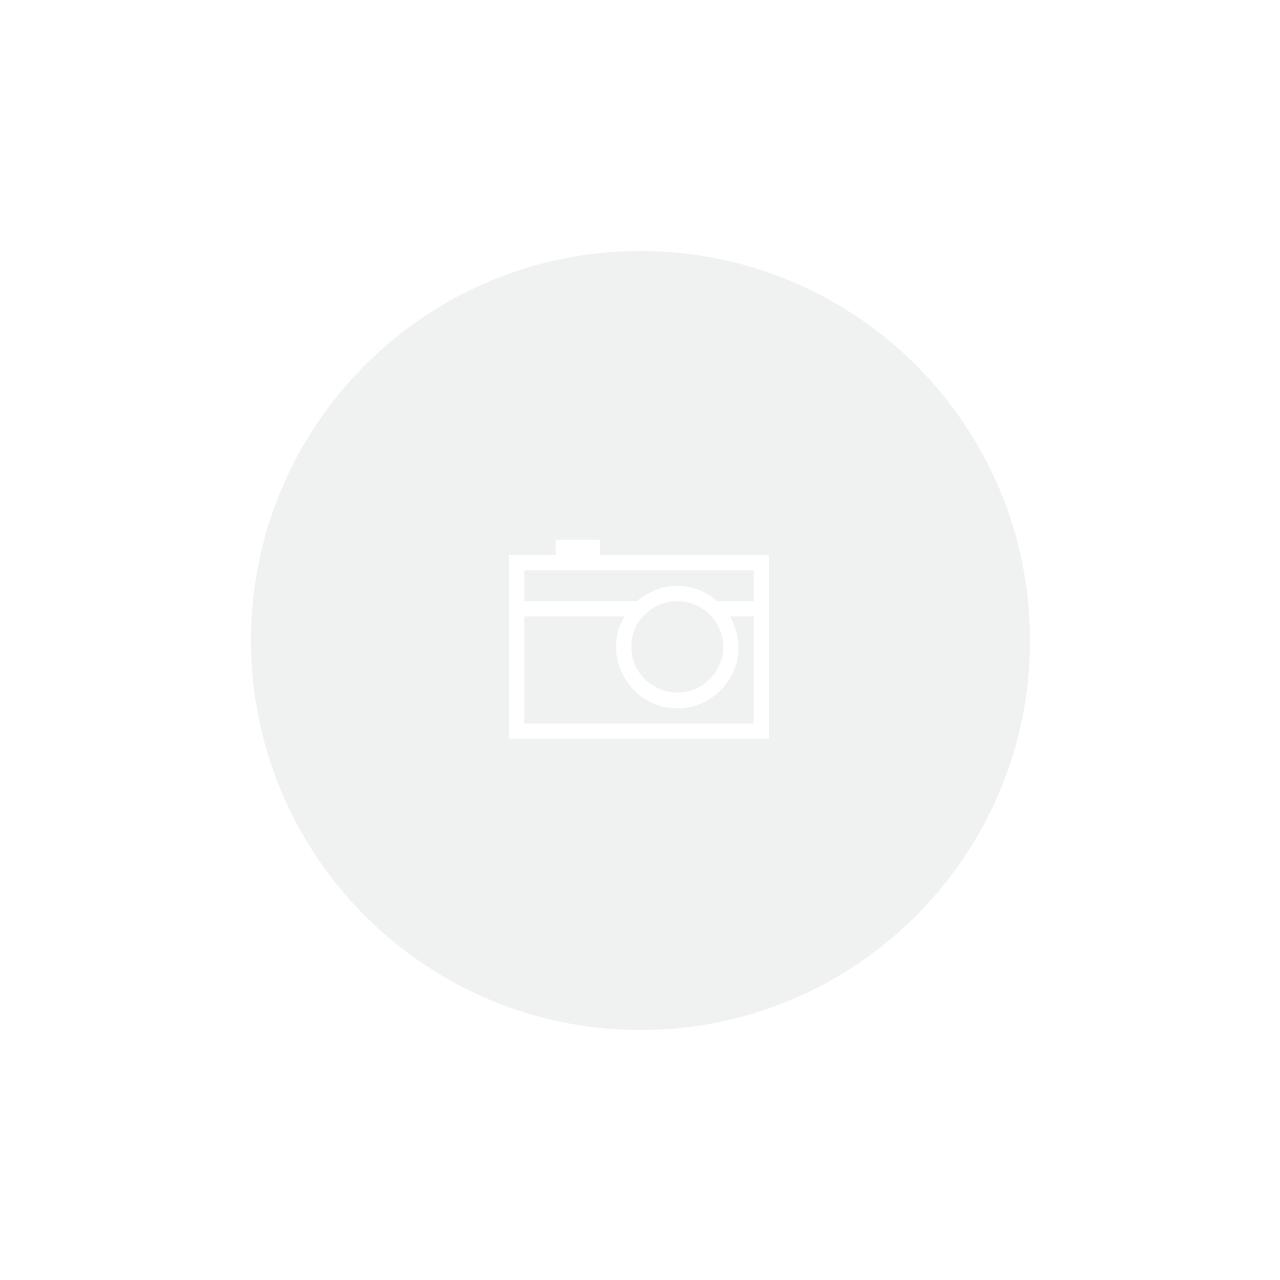 Blusa Onça Cardada 115IF17 Est 004